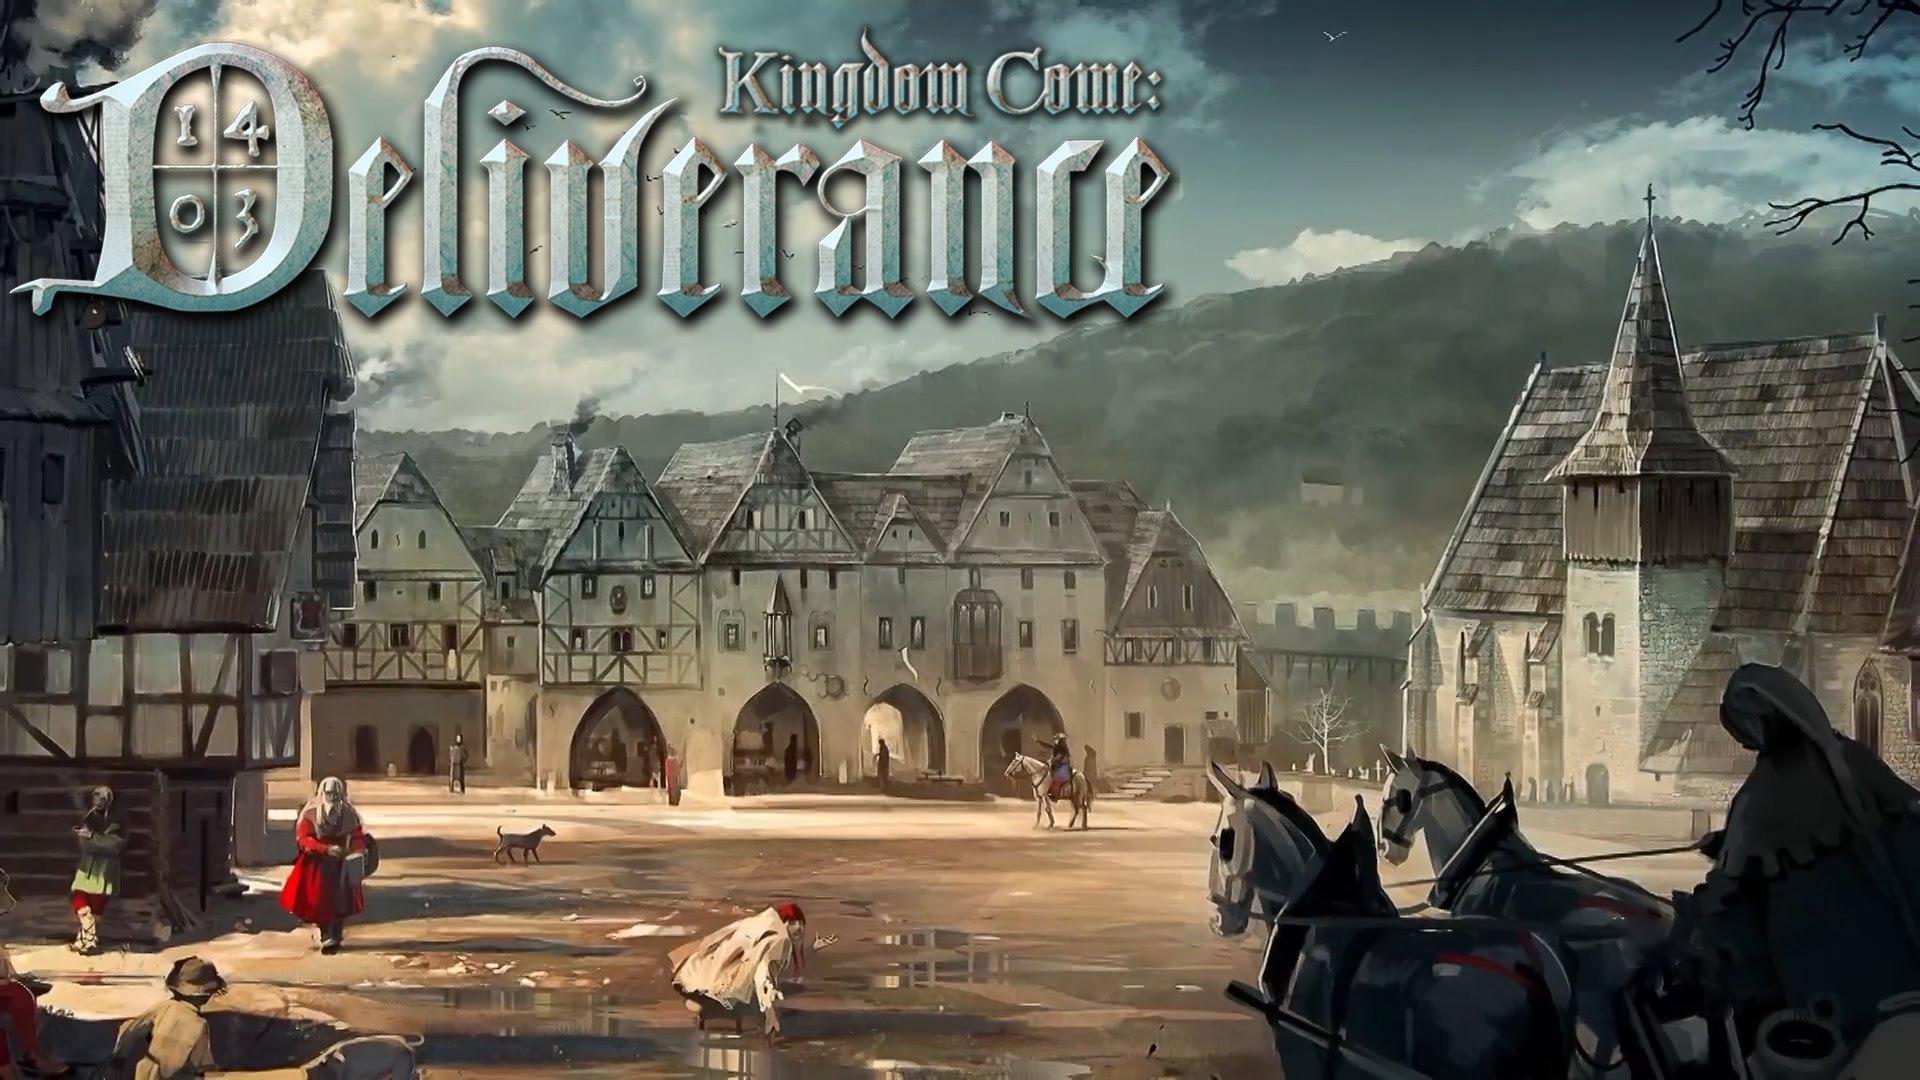 Kingdom Come Deliverance Background